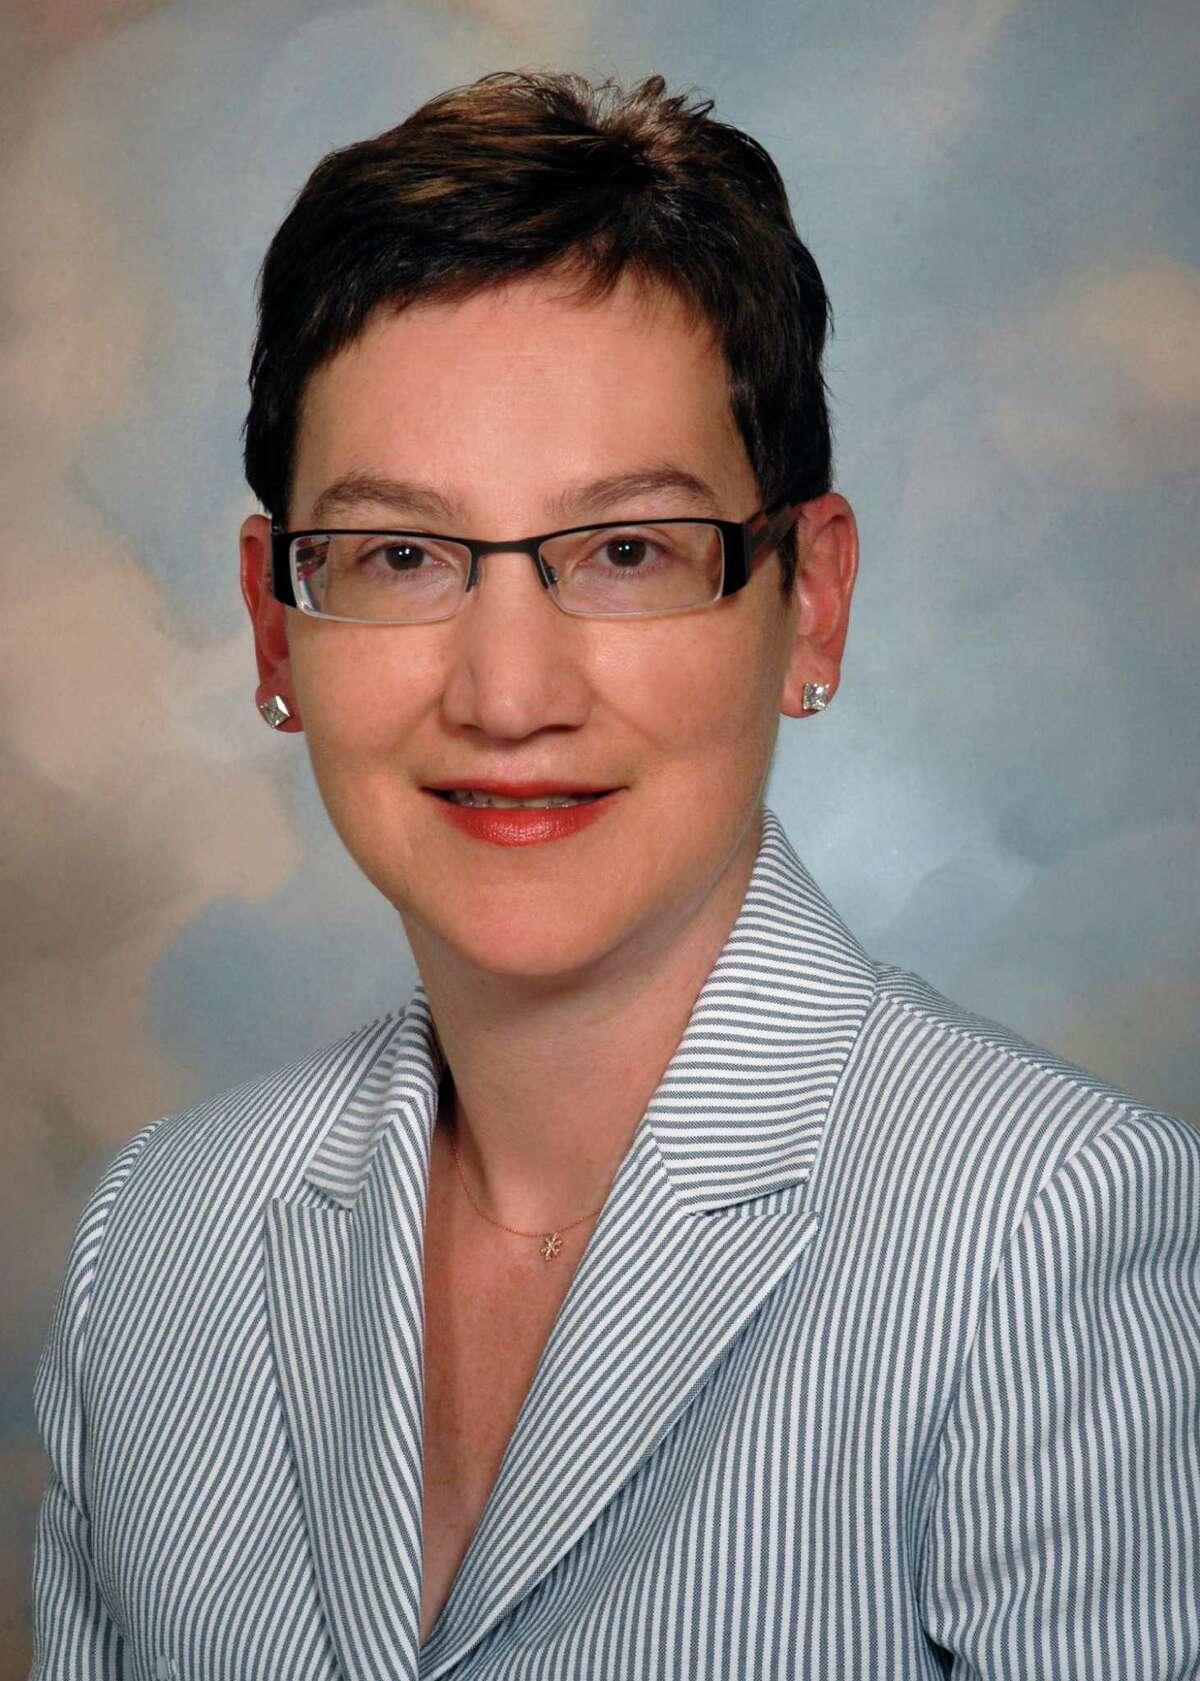 20. Dr. Carrie Byington, vice chancellor health services Texas A&M Health Science Center Compensation:$870,834